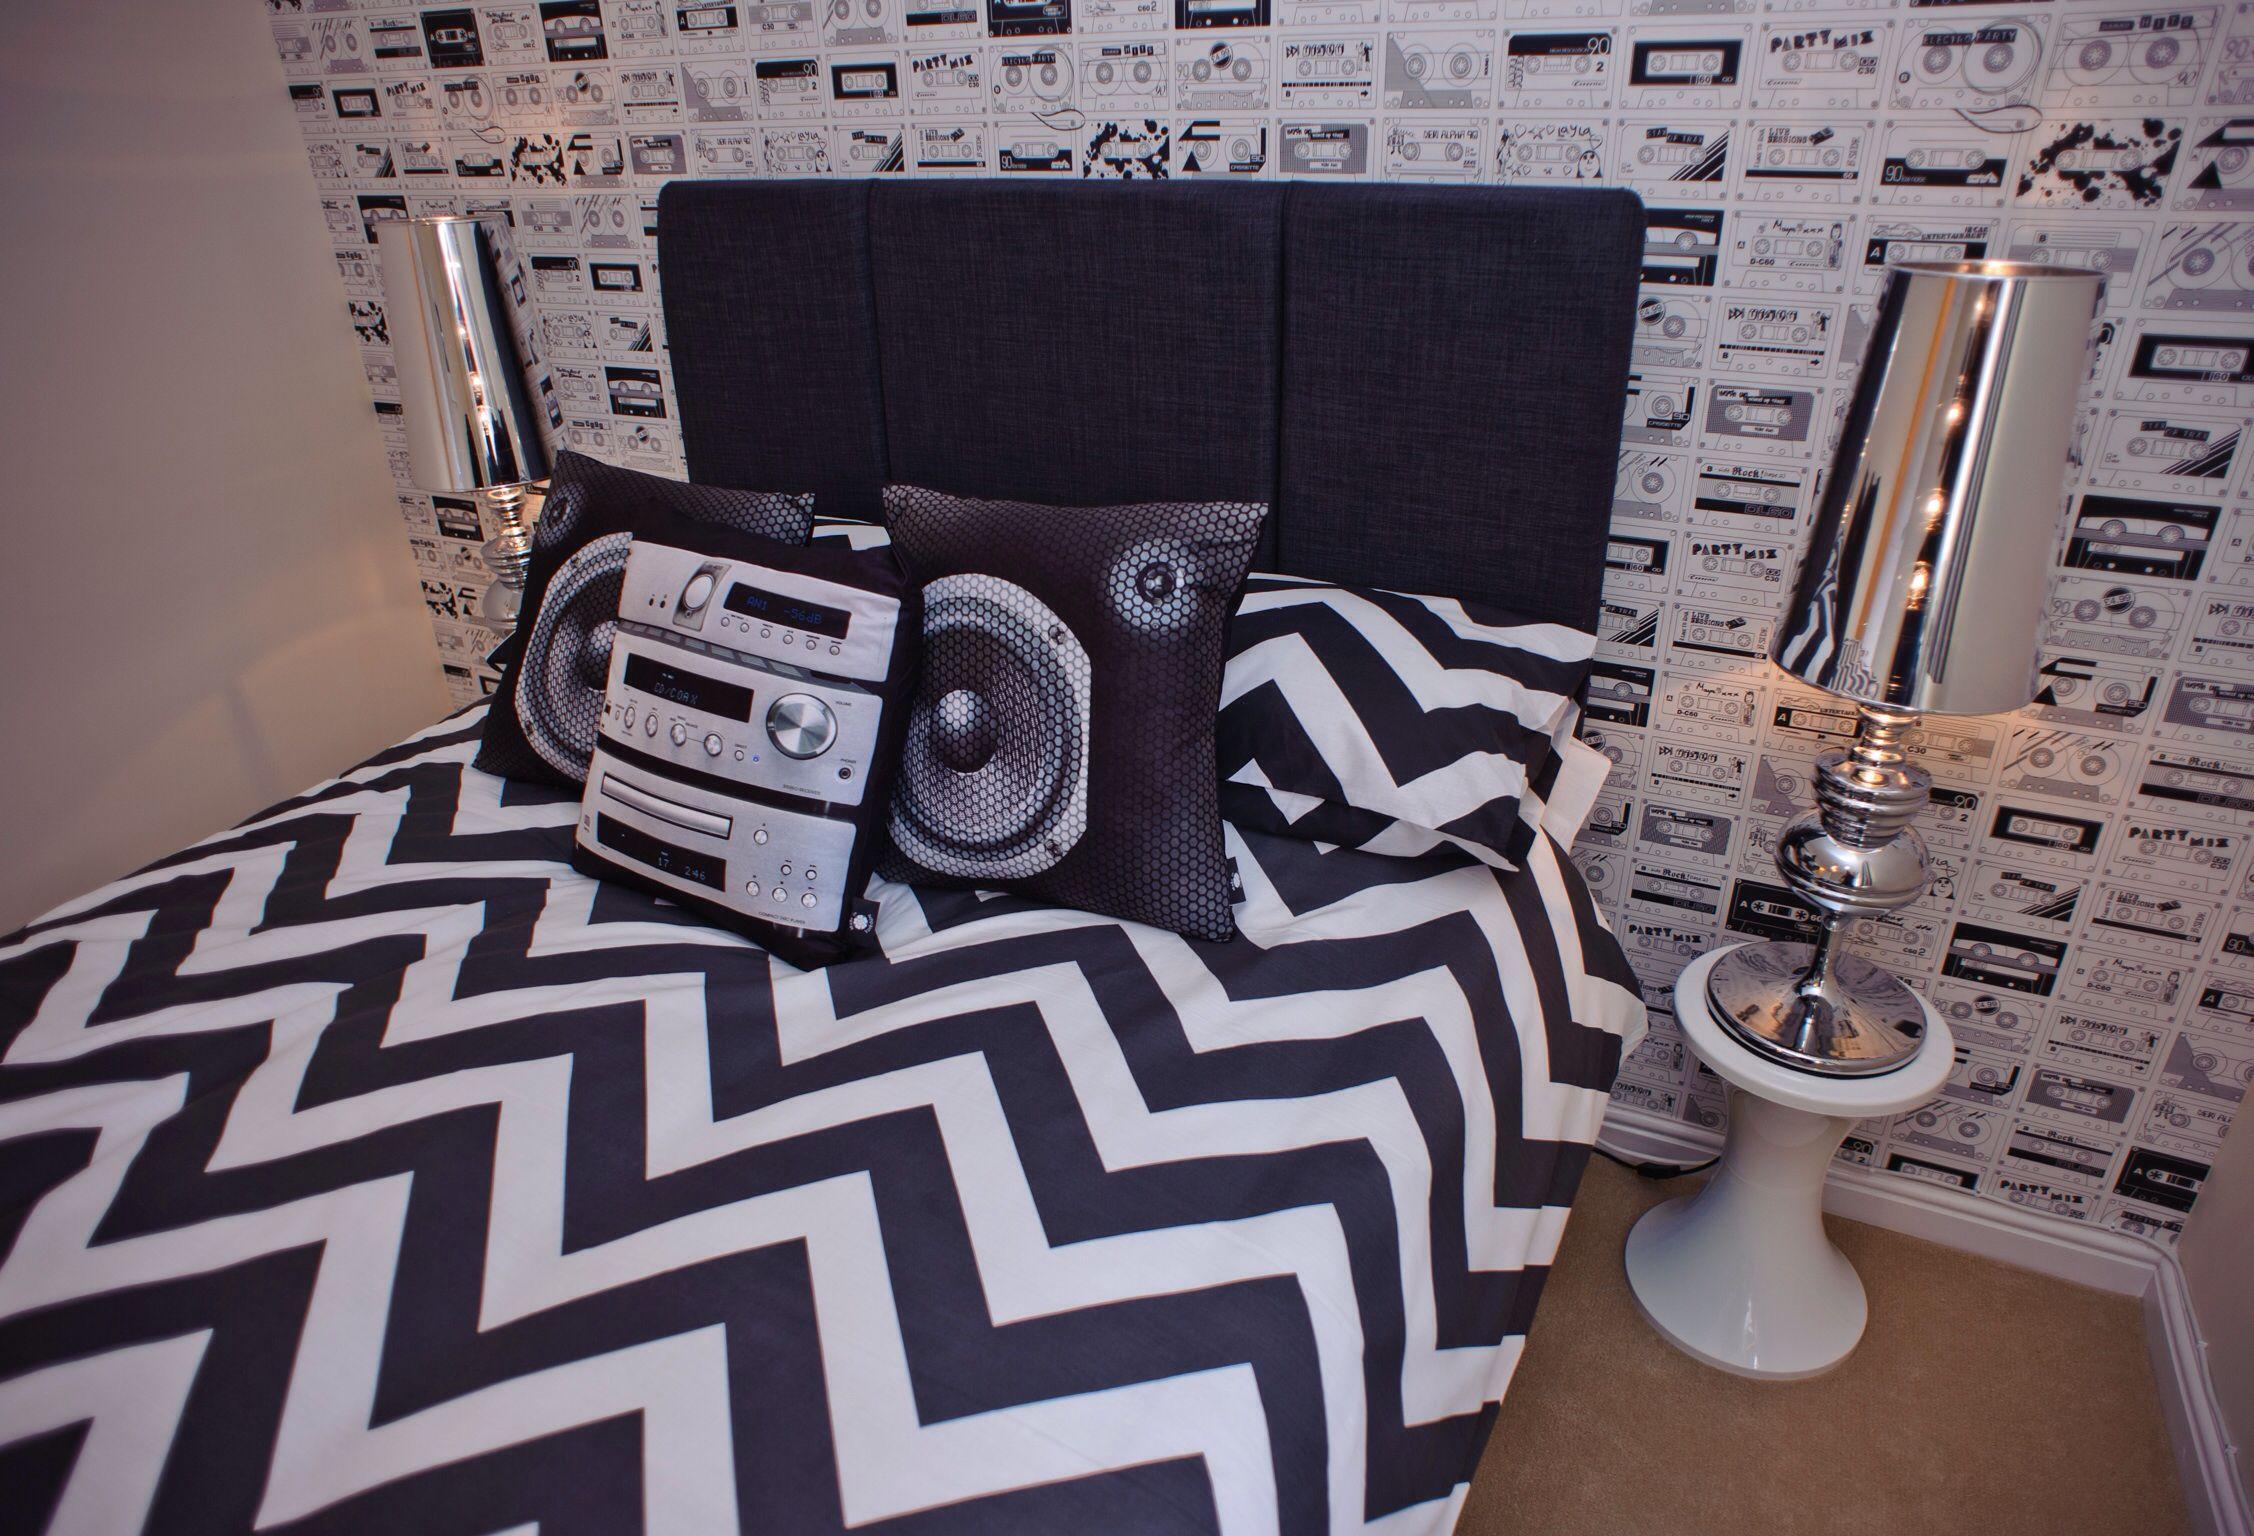 Our Show Home At Cae Nant Cwmbran Teens Music Themed Bedroom - Music themed bedroom decorating ideas